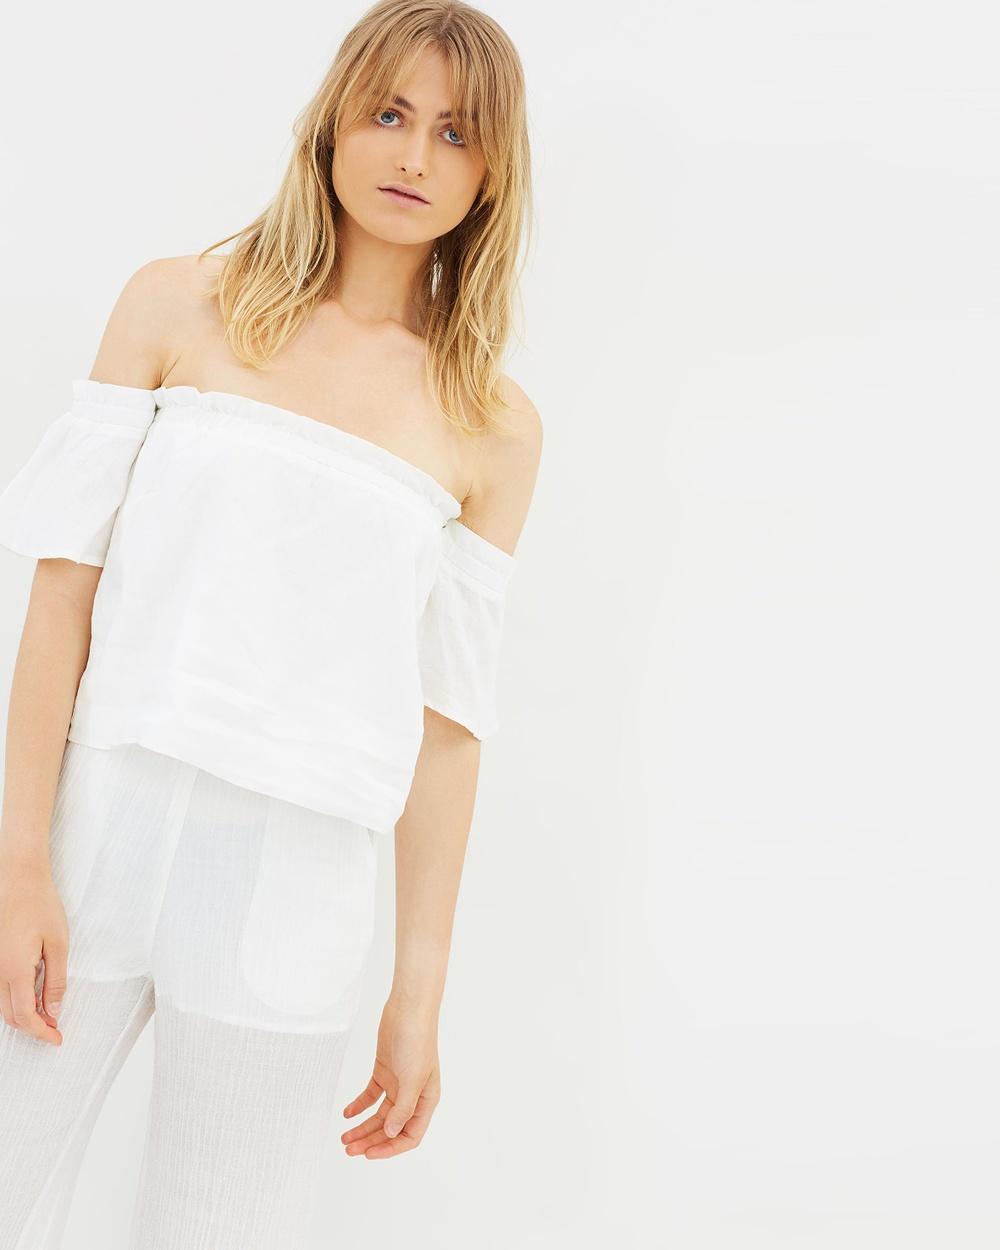 Hansen & Gretel Paris Linen Top Tops White Paris Linen Top